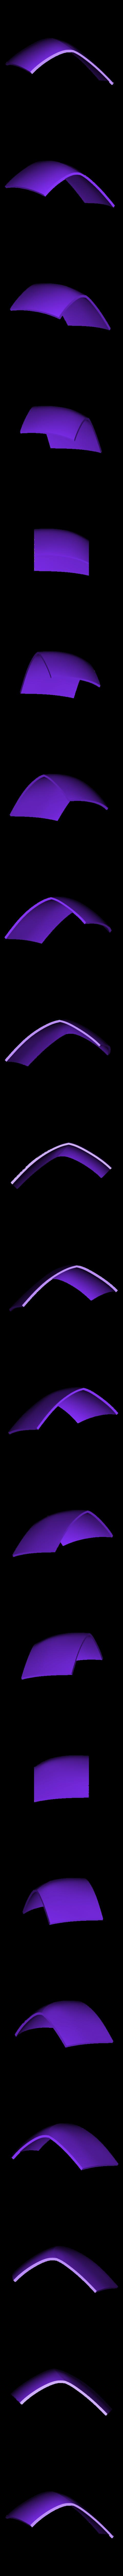 Part_13.stl Download free STL file Red Hood Helmet (Batman) • 3D printer object, VillainousPropShop